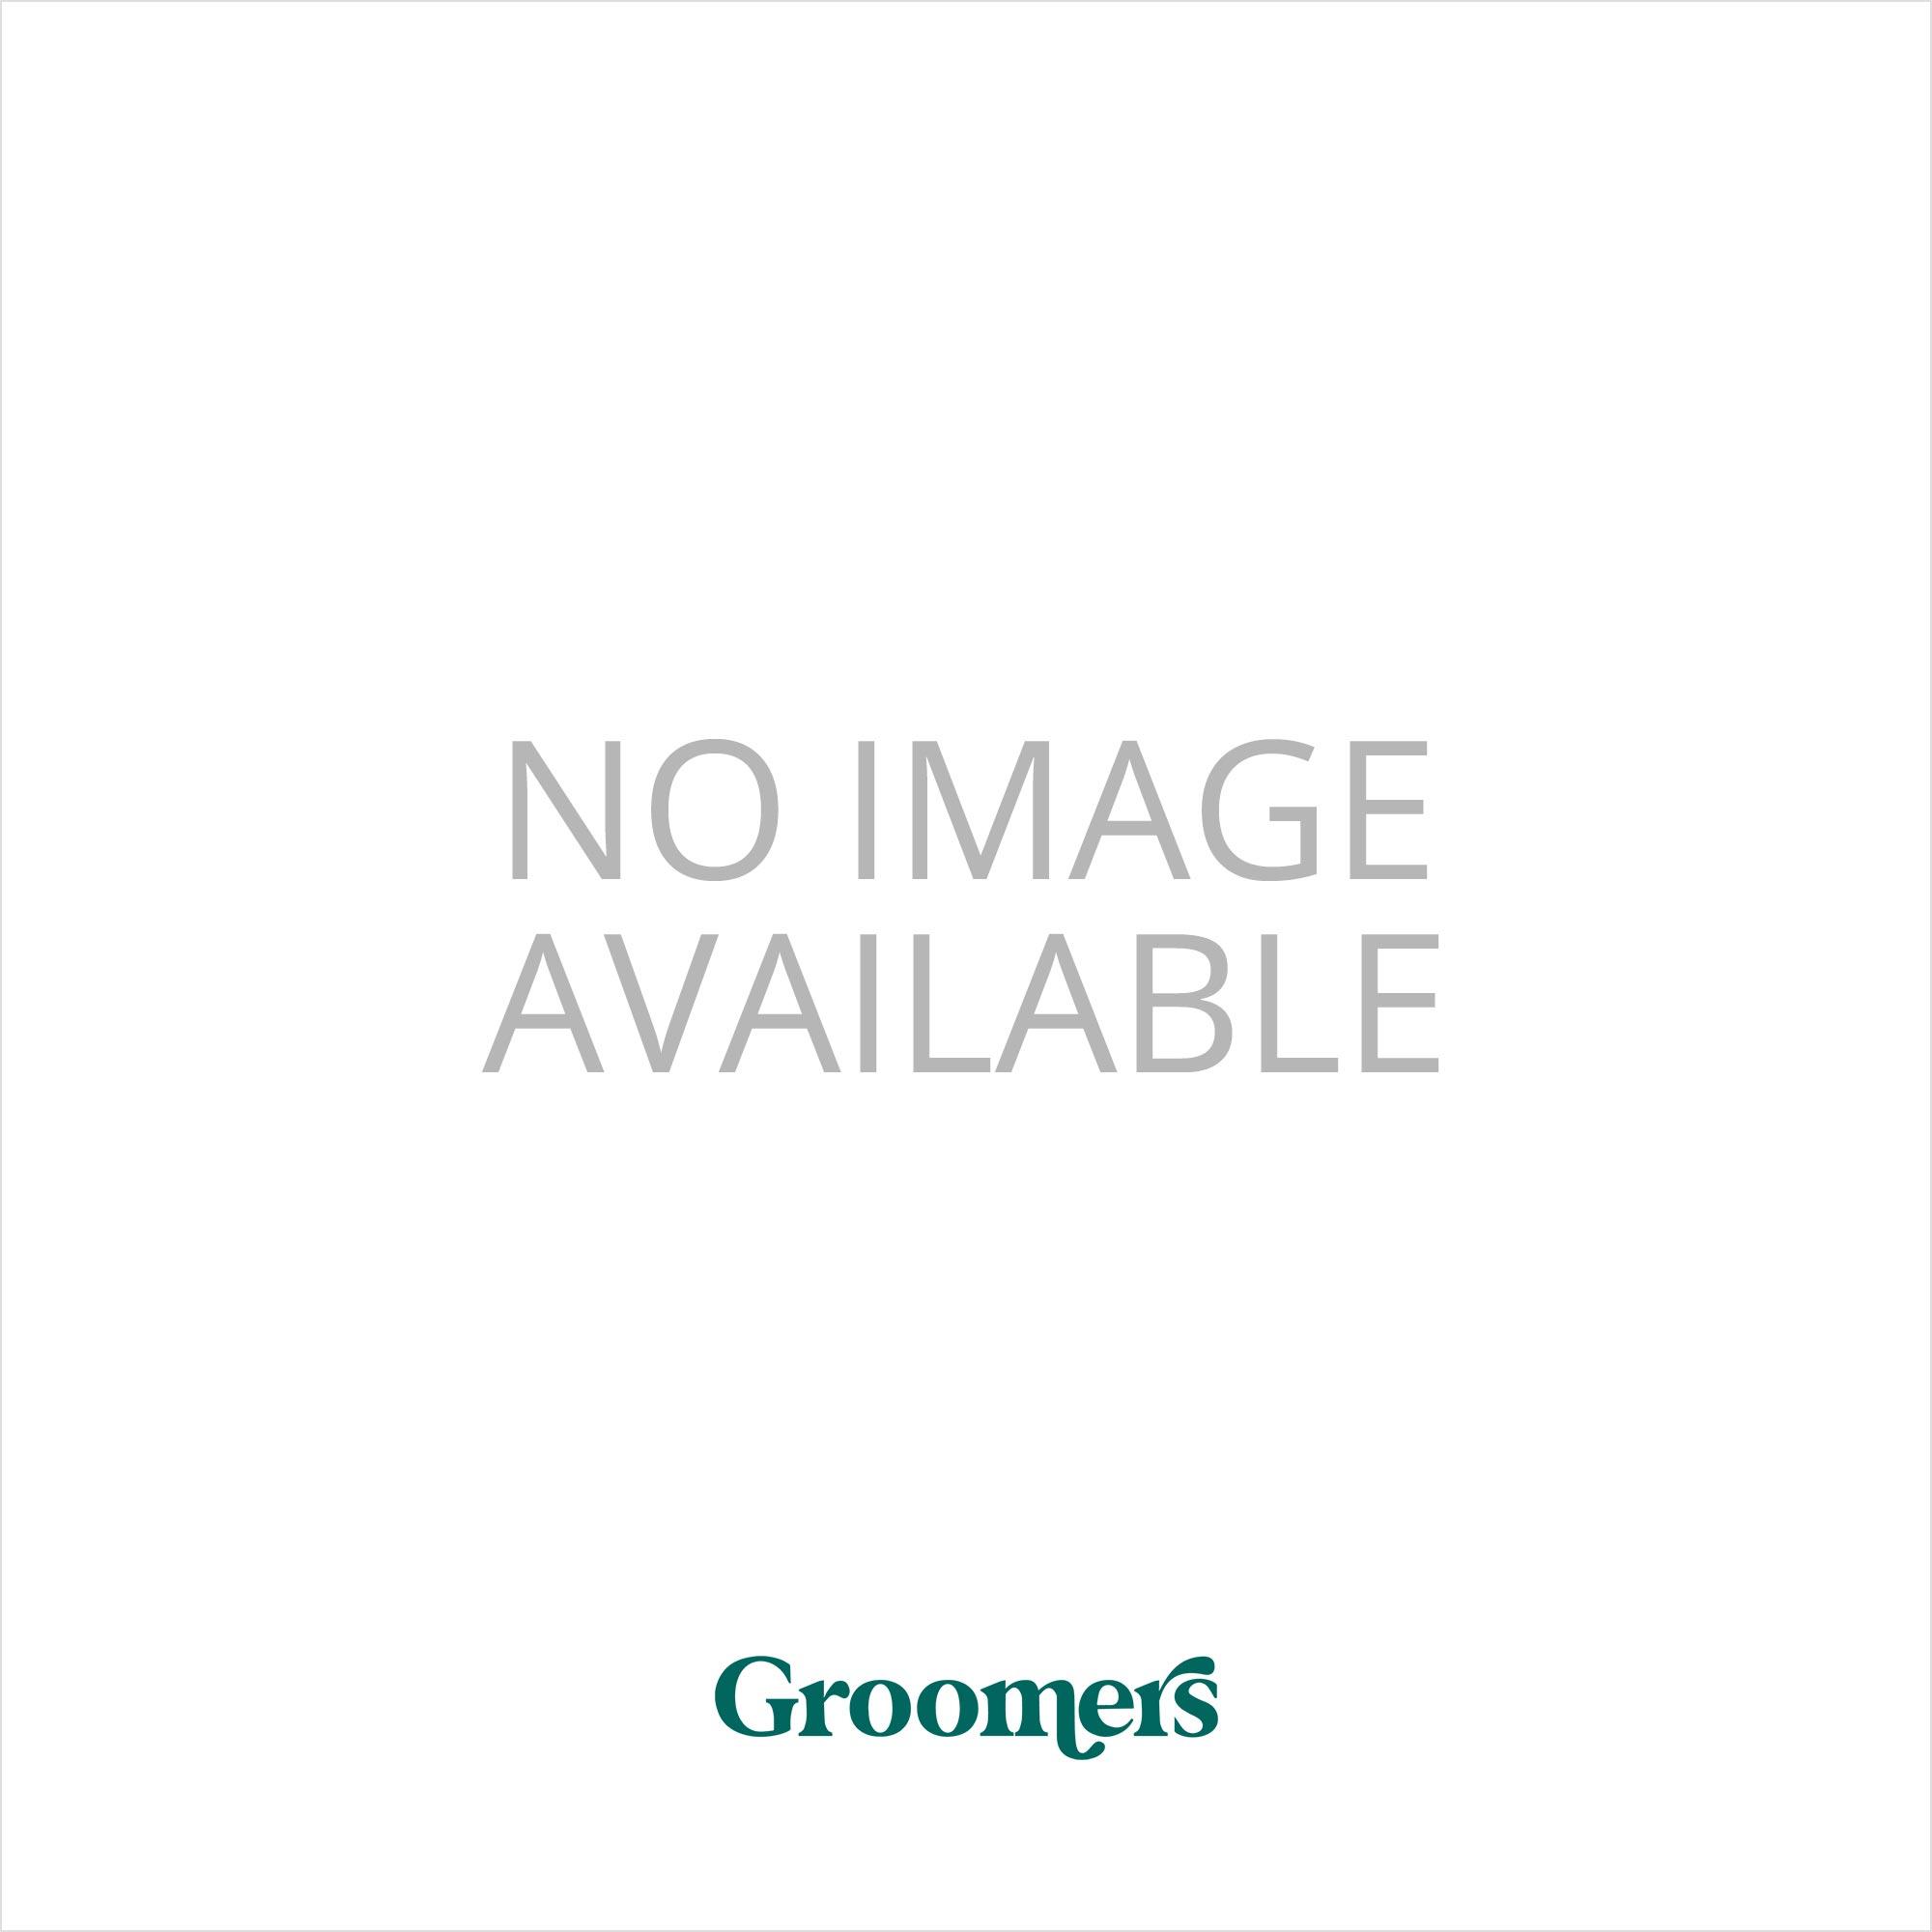 Groomers Medicated Shampoo - Retail